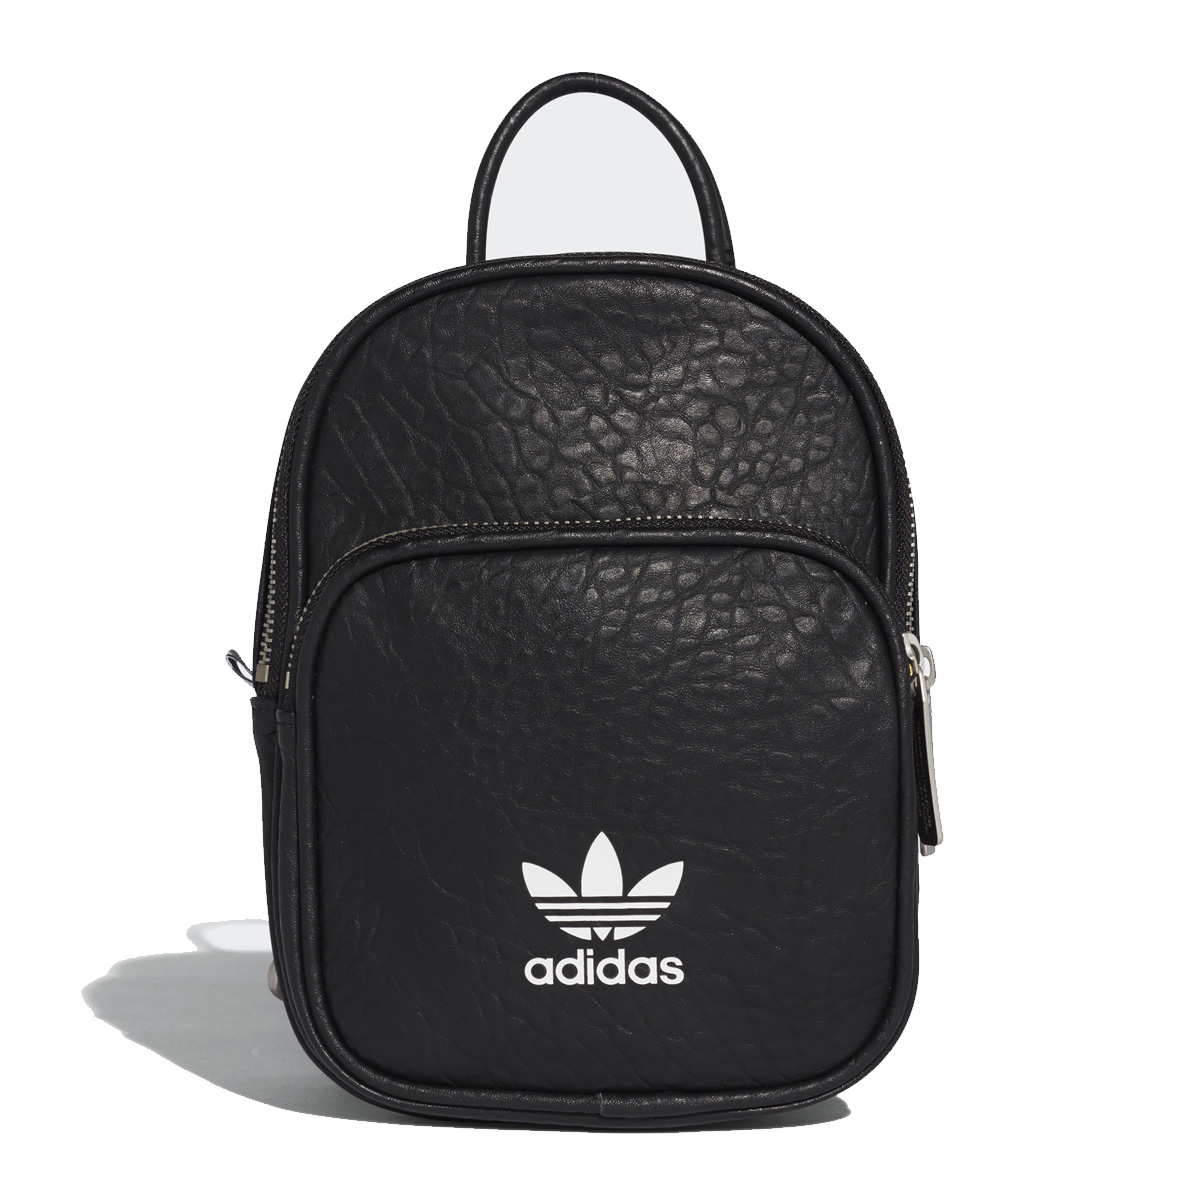 671dd93ac05 adidas Originals BACKPACK CLASSIC X MINI ADICOLOR (Adidas originals  backpack classical music X ミニアディカラー) 17FW-I